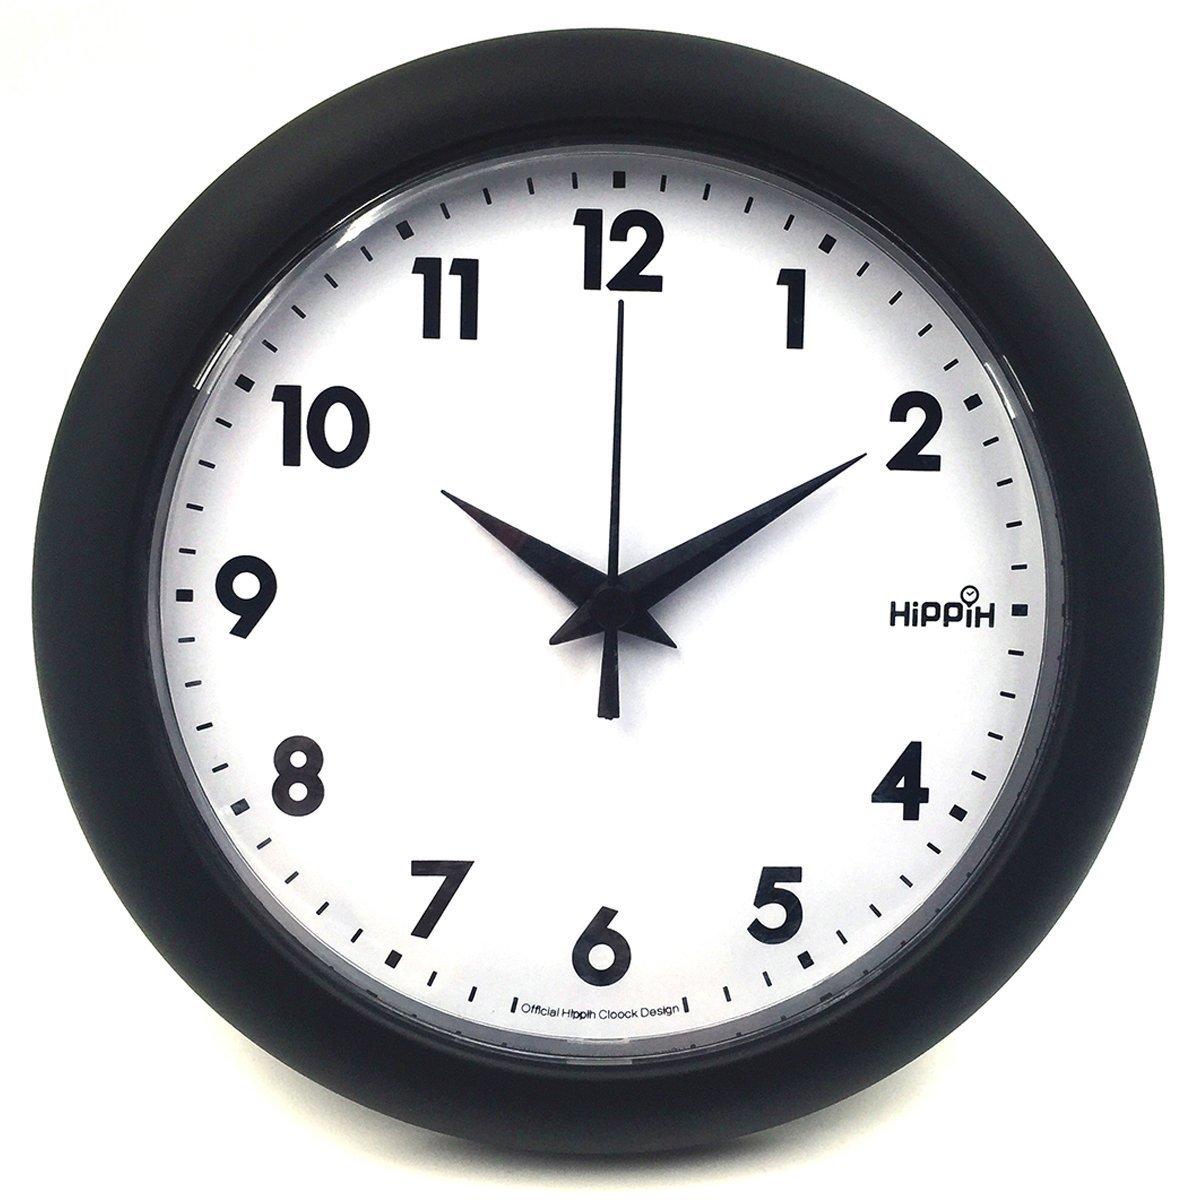 Amazon hippih 10 silent quartz decorative wall clock non amazon hippih 10 silent quartz decorative wall clock non ticking black 249 a home kitchen amipublicfo Images